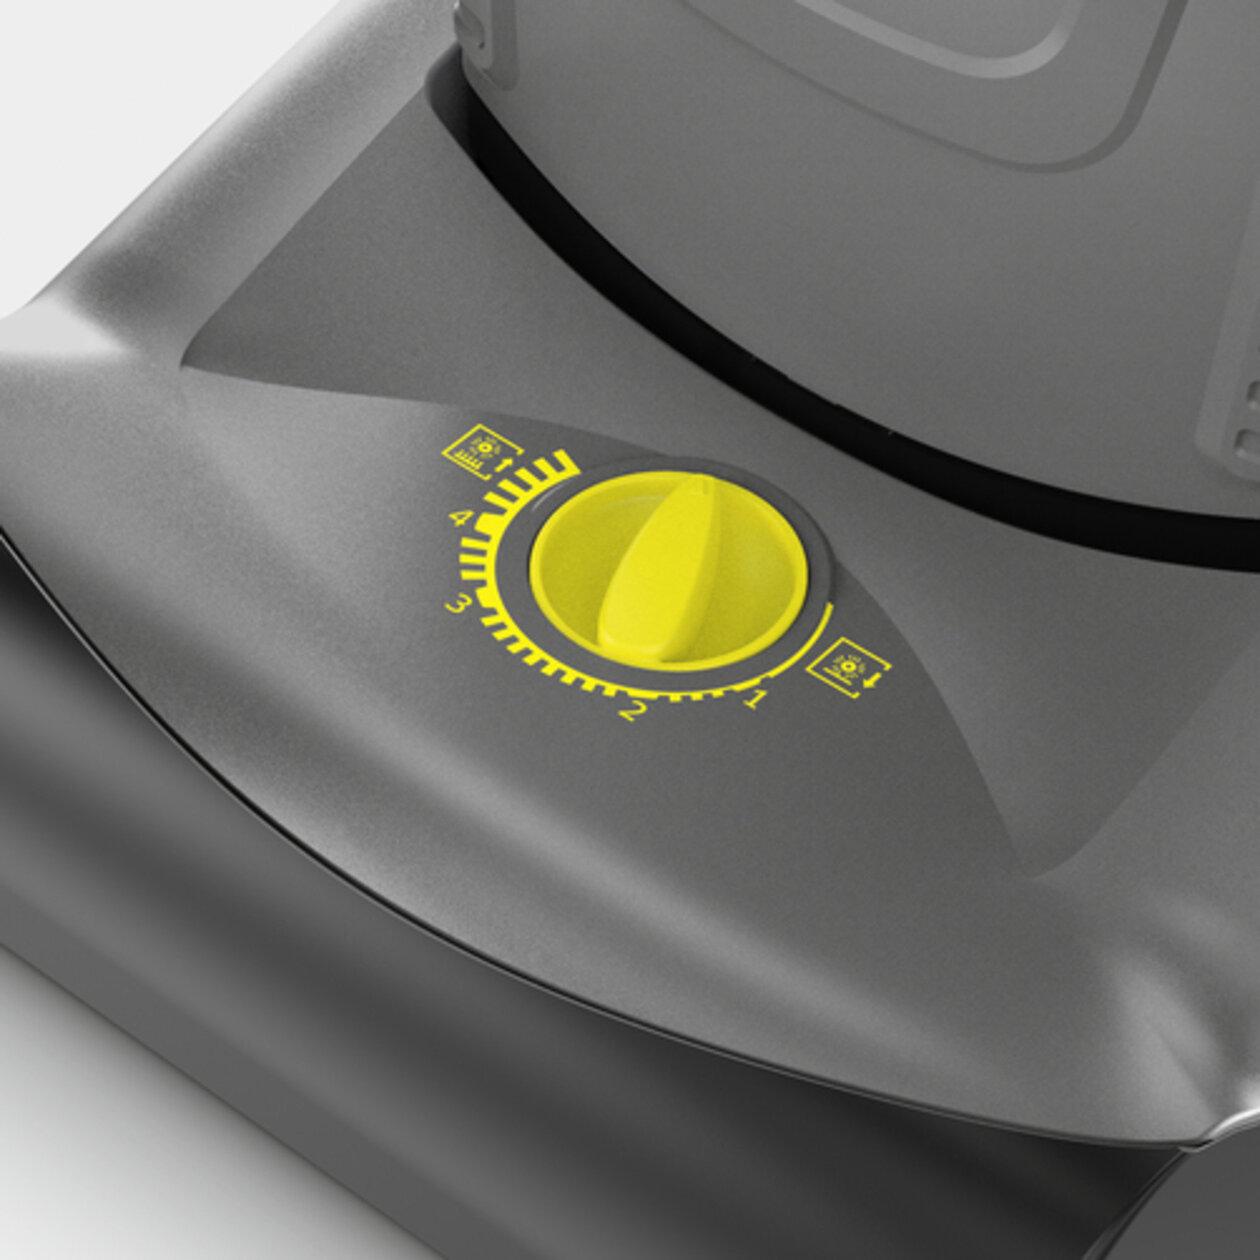 Upright brush-type vacuum cleaner CV 30/1: Manual roller brush adjustment